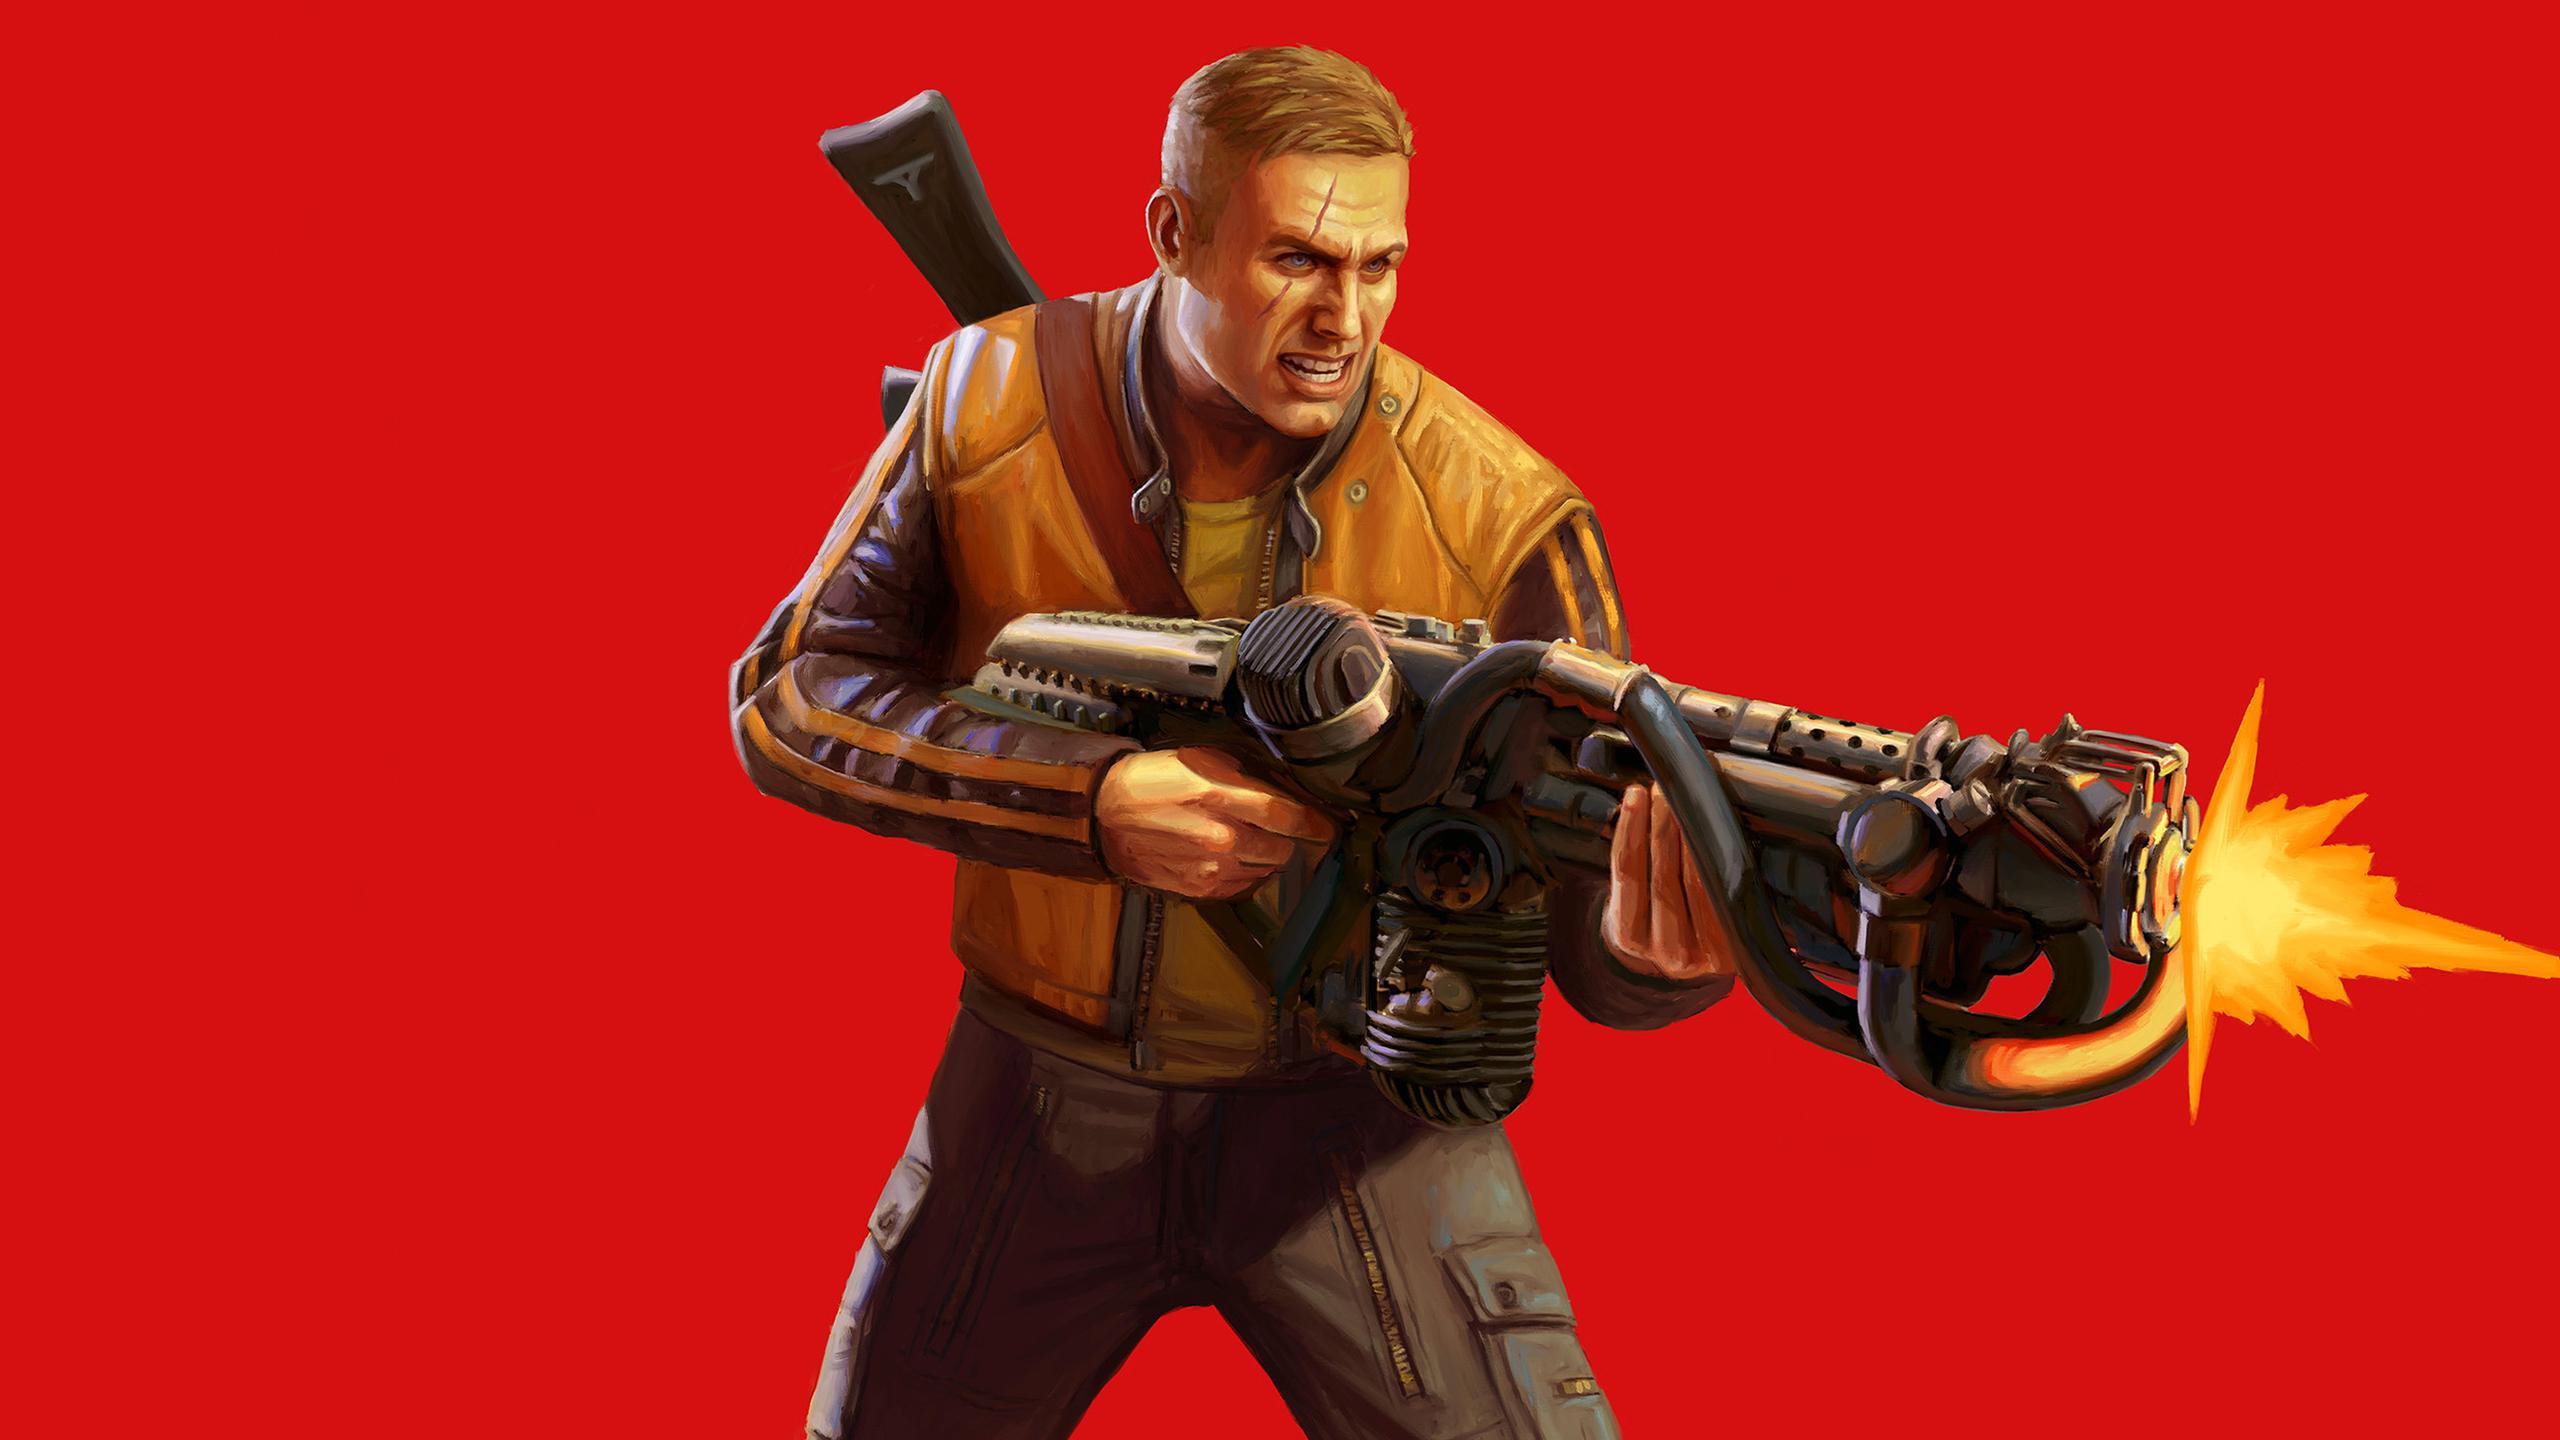 Terror Billy Wolfenstein Ii The New Colossus Wallpaper Hd Games